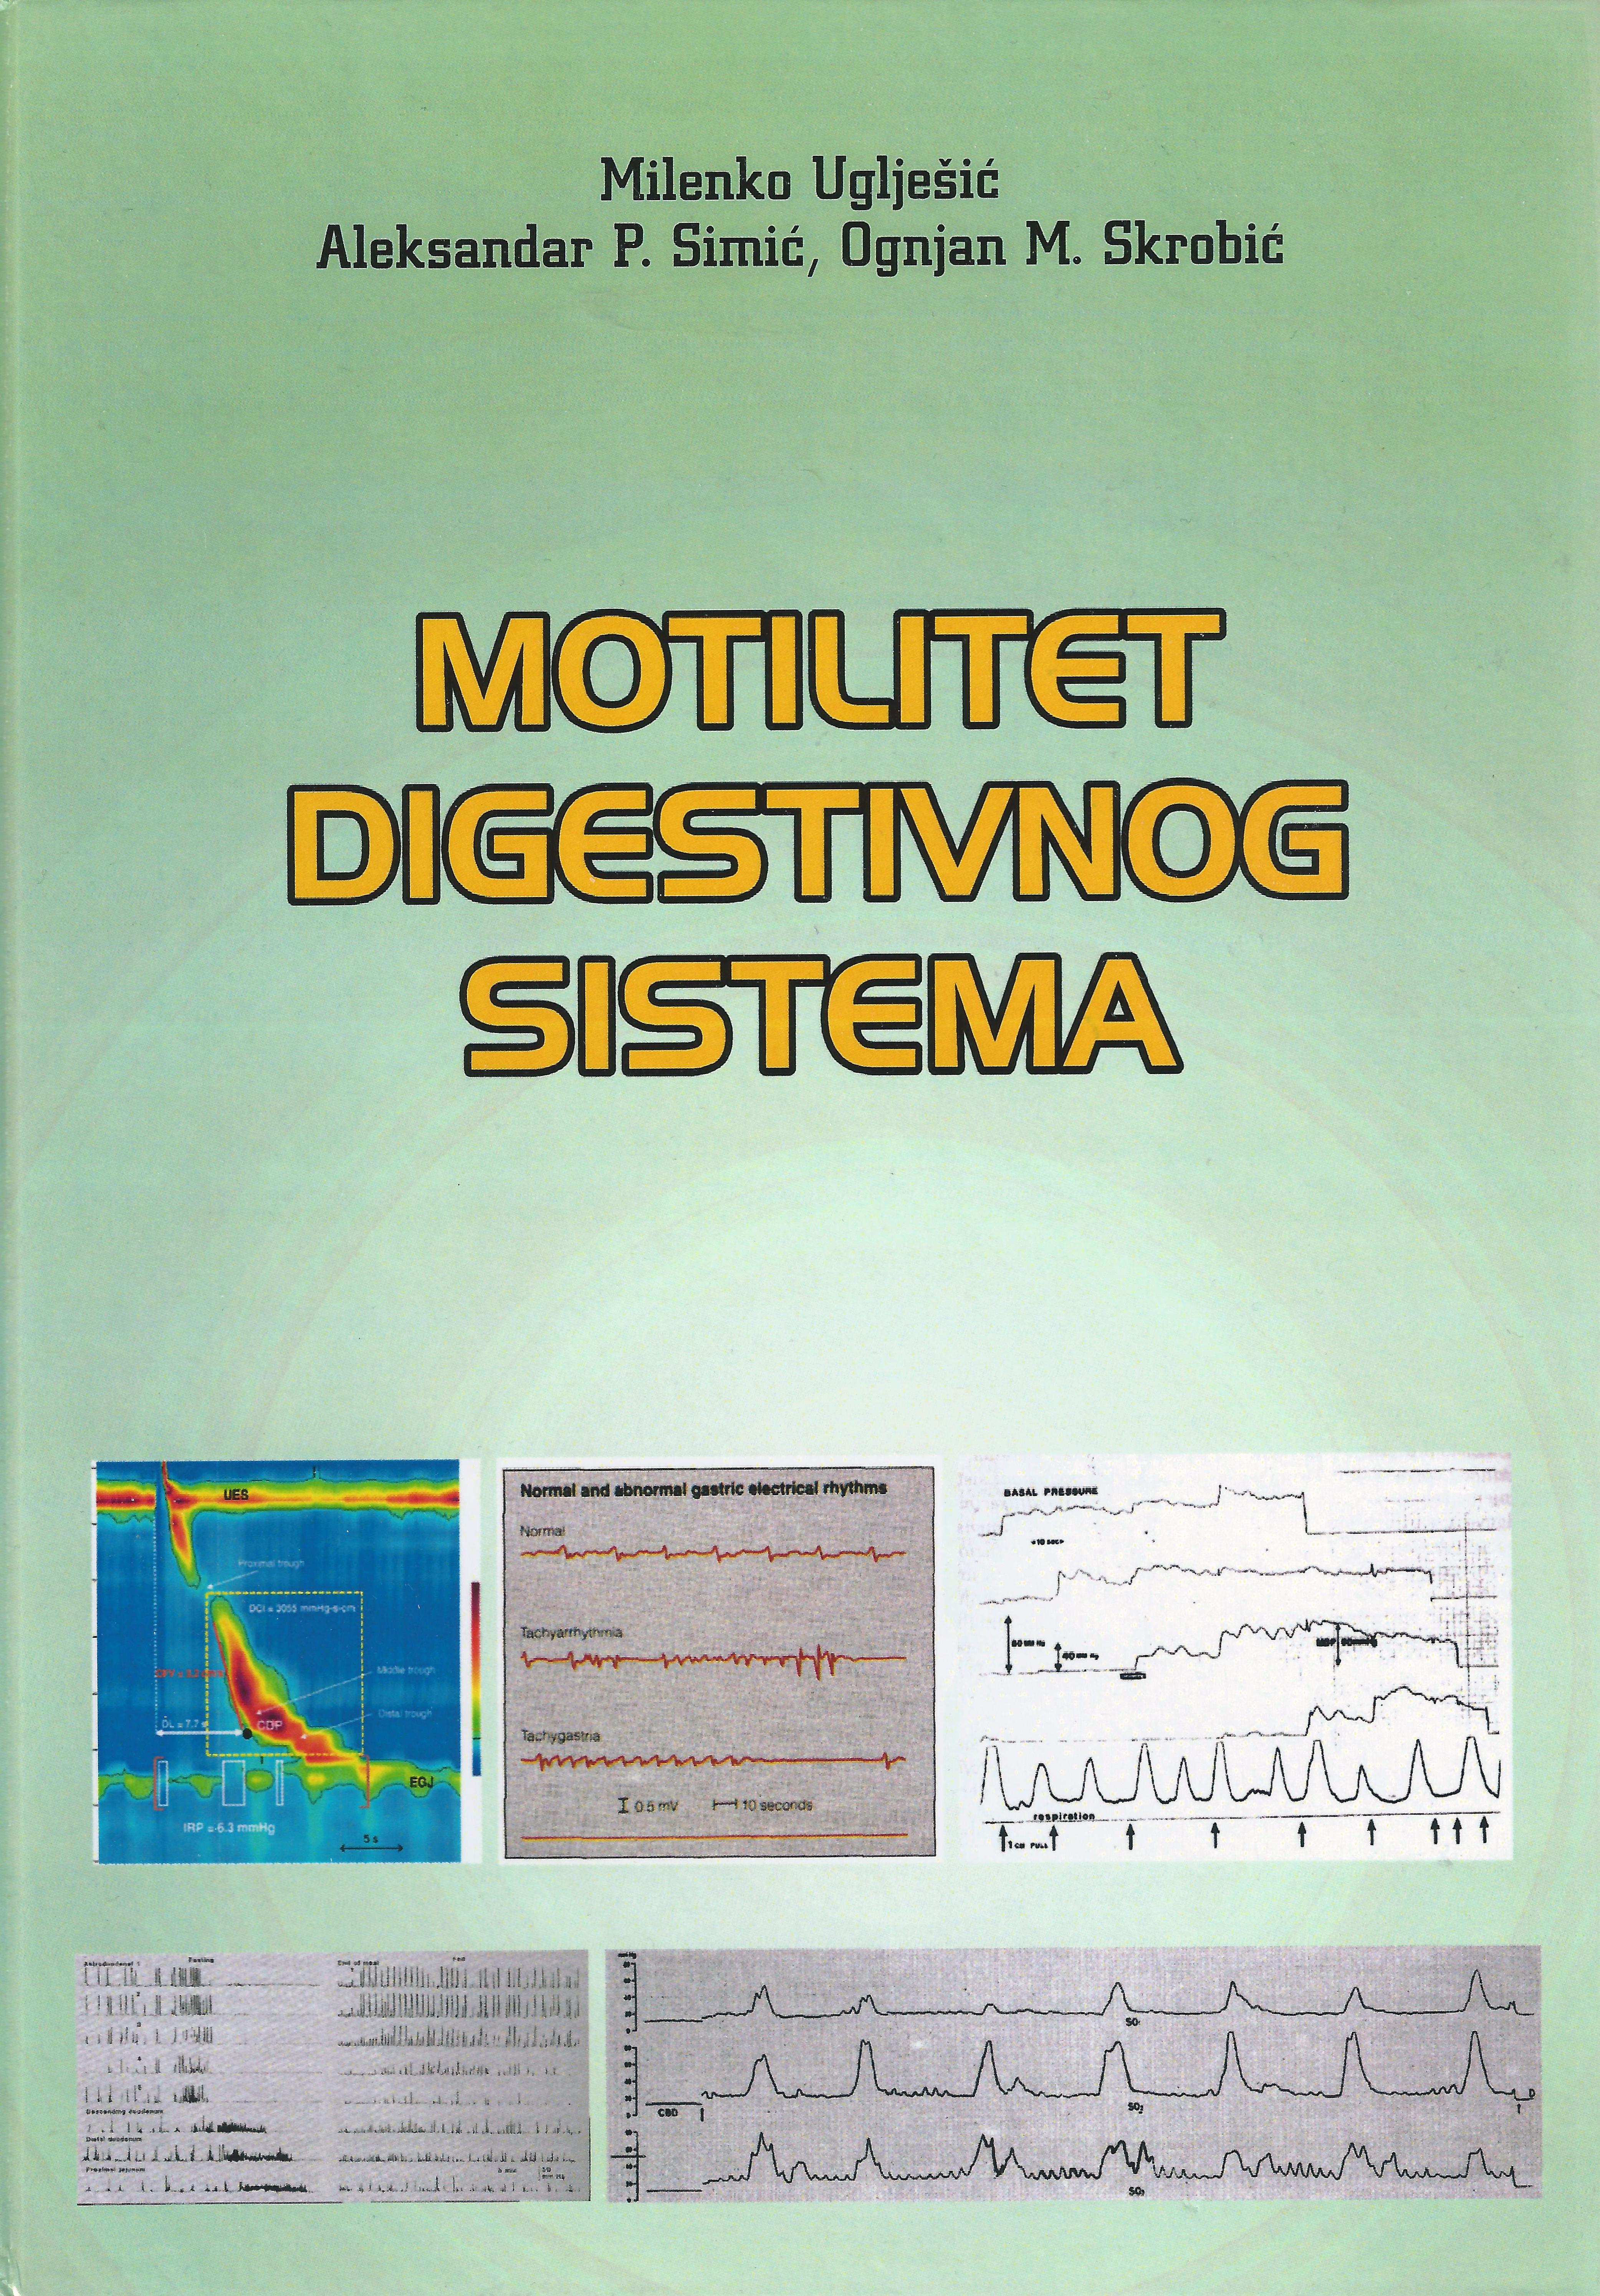 Motilitet Digestivnog Sistema